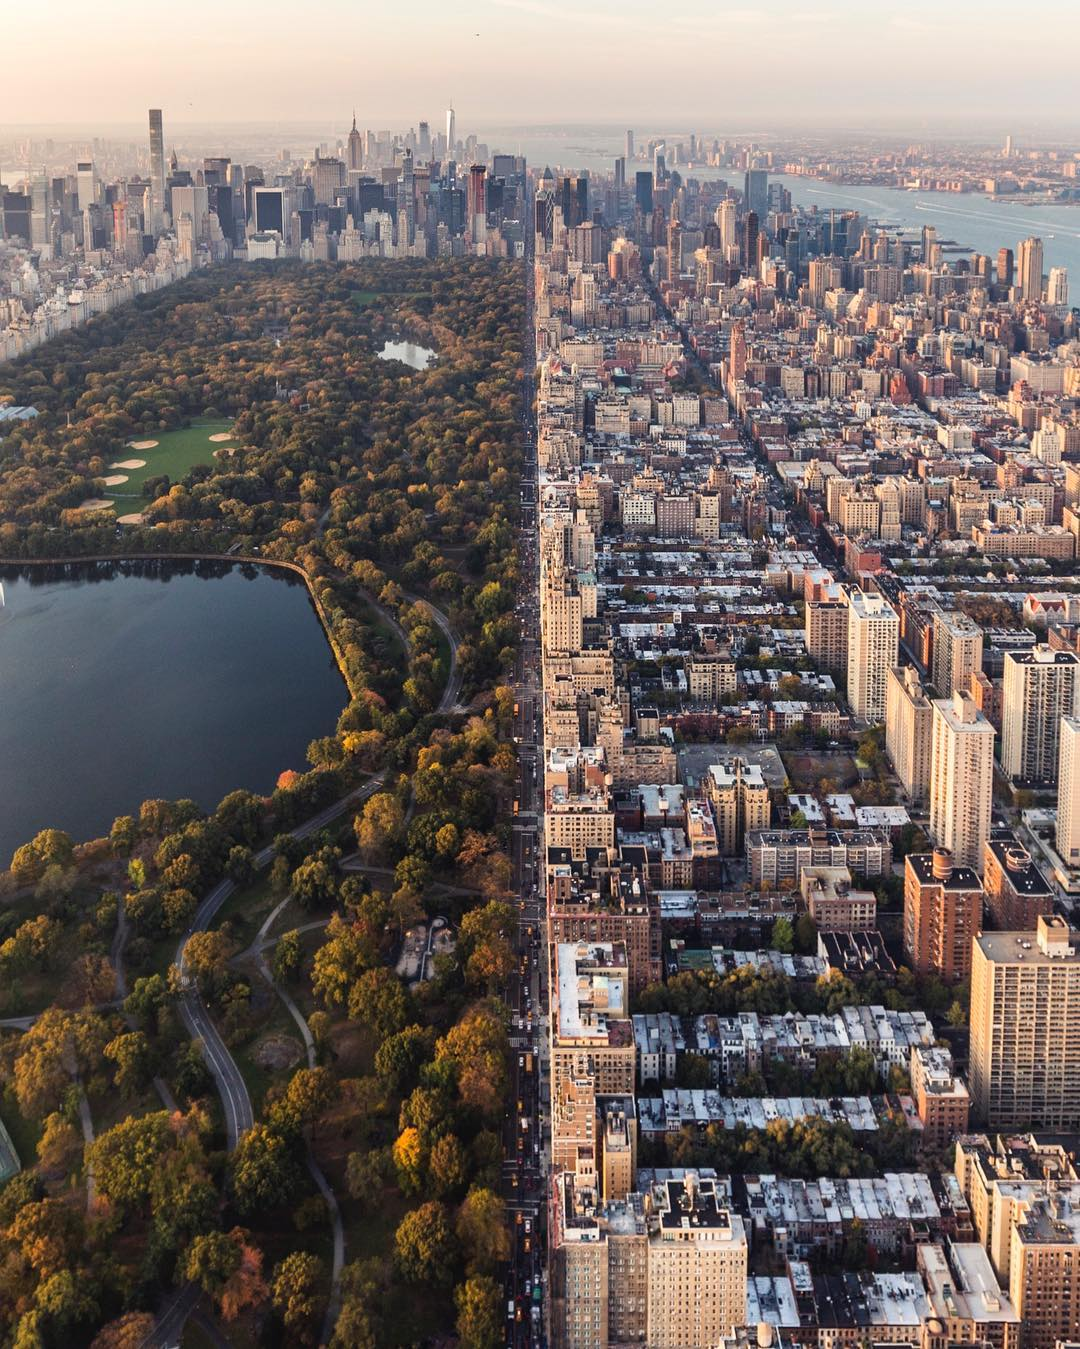 Central park - Kiến trúc sư cảnh quan Law Olmsted